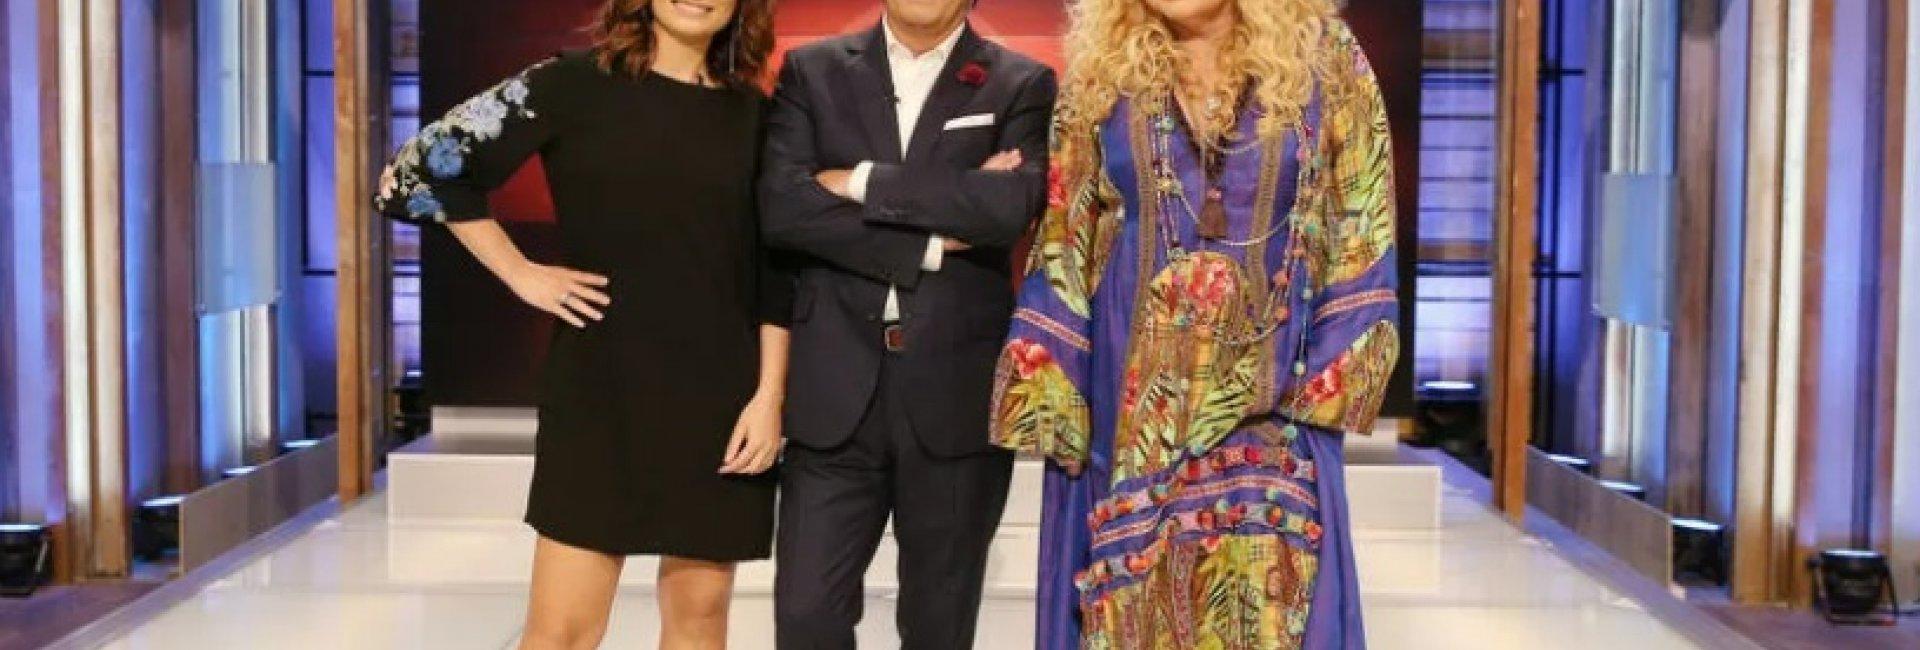 Finał programu TVN MasterChef 2020